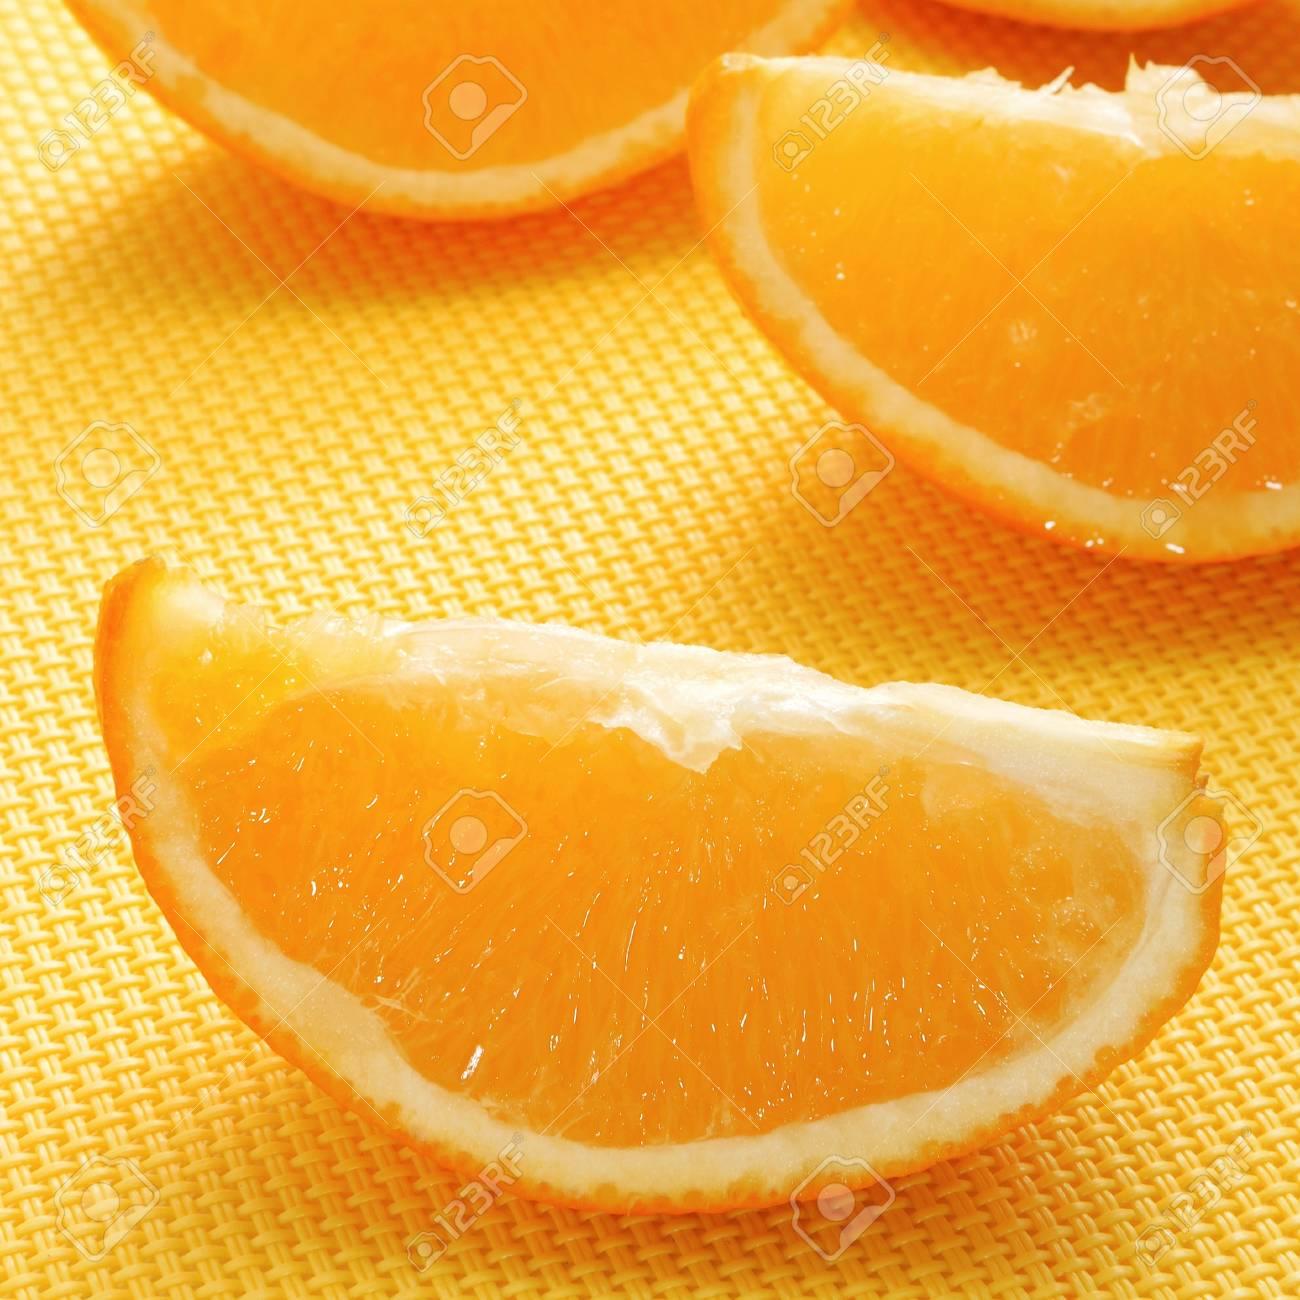 some slices of orange on an orange tablecloth Stock Photo - 17116722